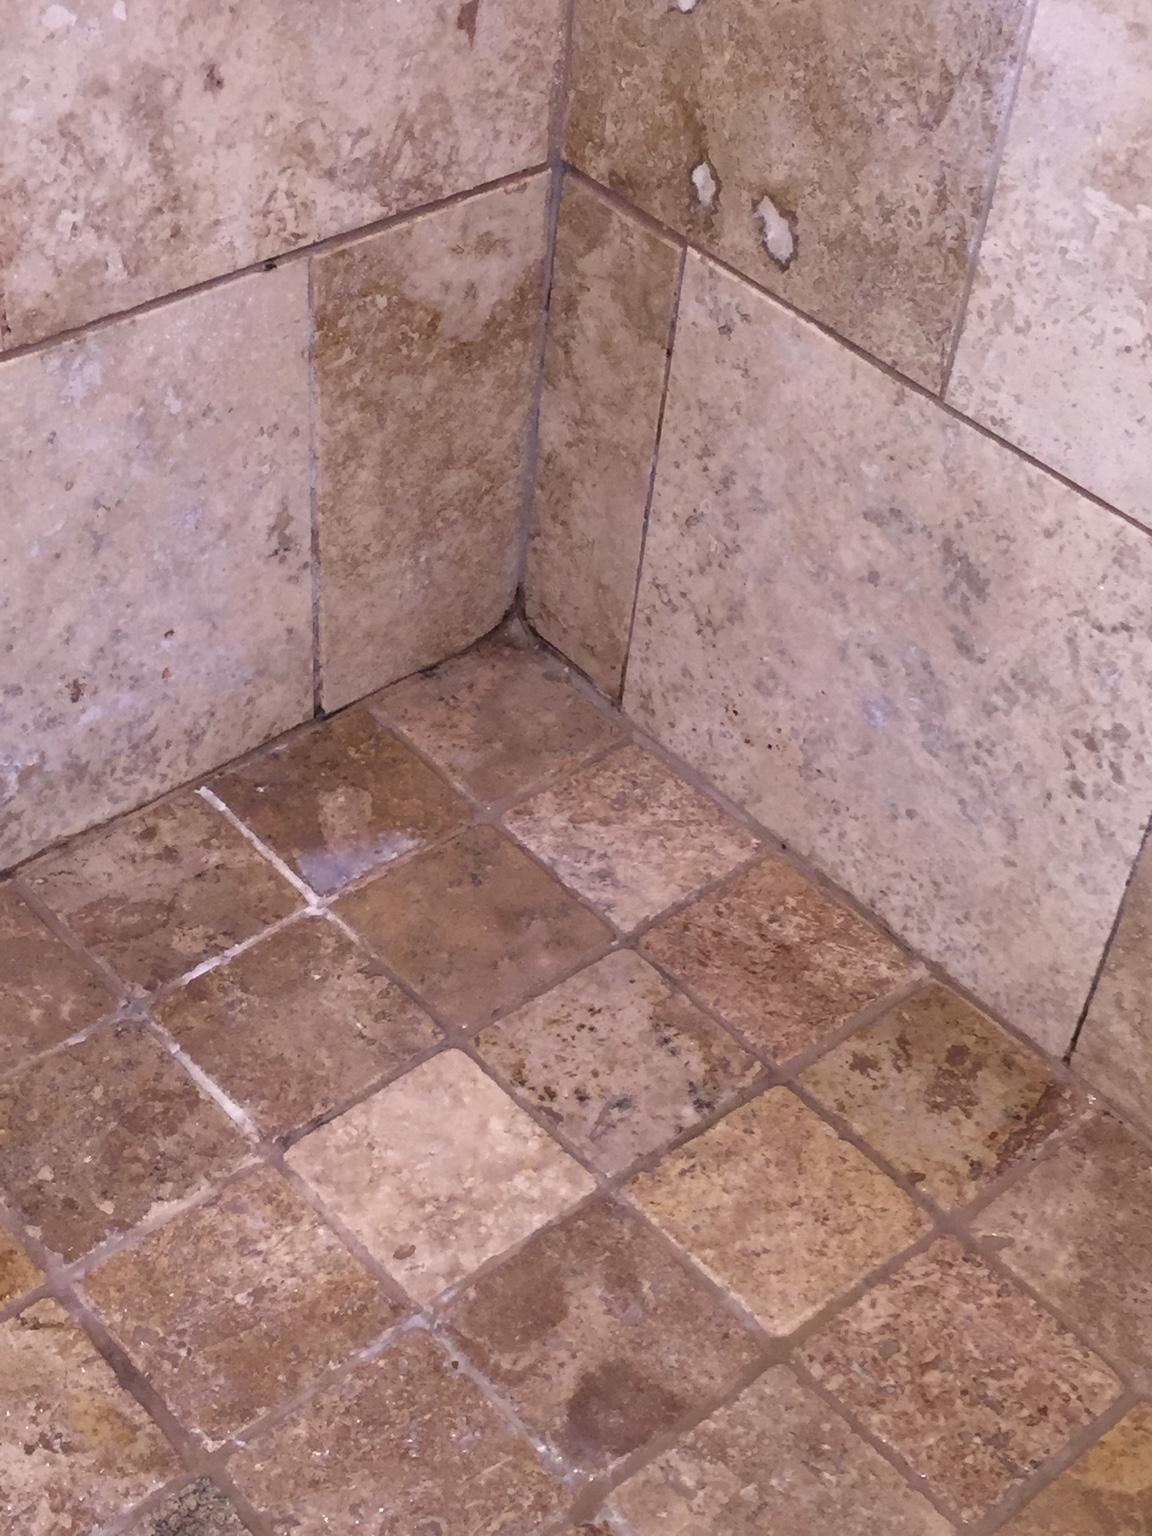 Of posts ceramic tile advice forums john bridge ceramic tile - Cc0804f1cd74beb21ec148247bfbde56 Jpg